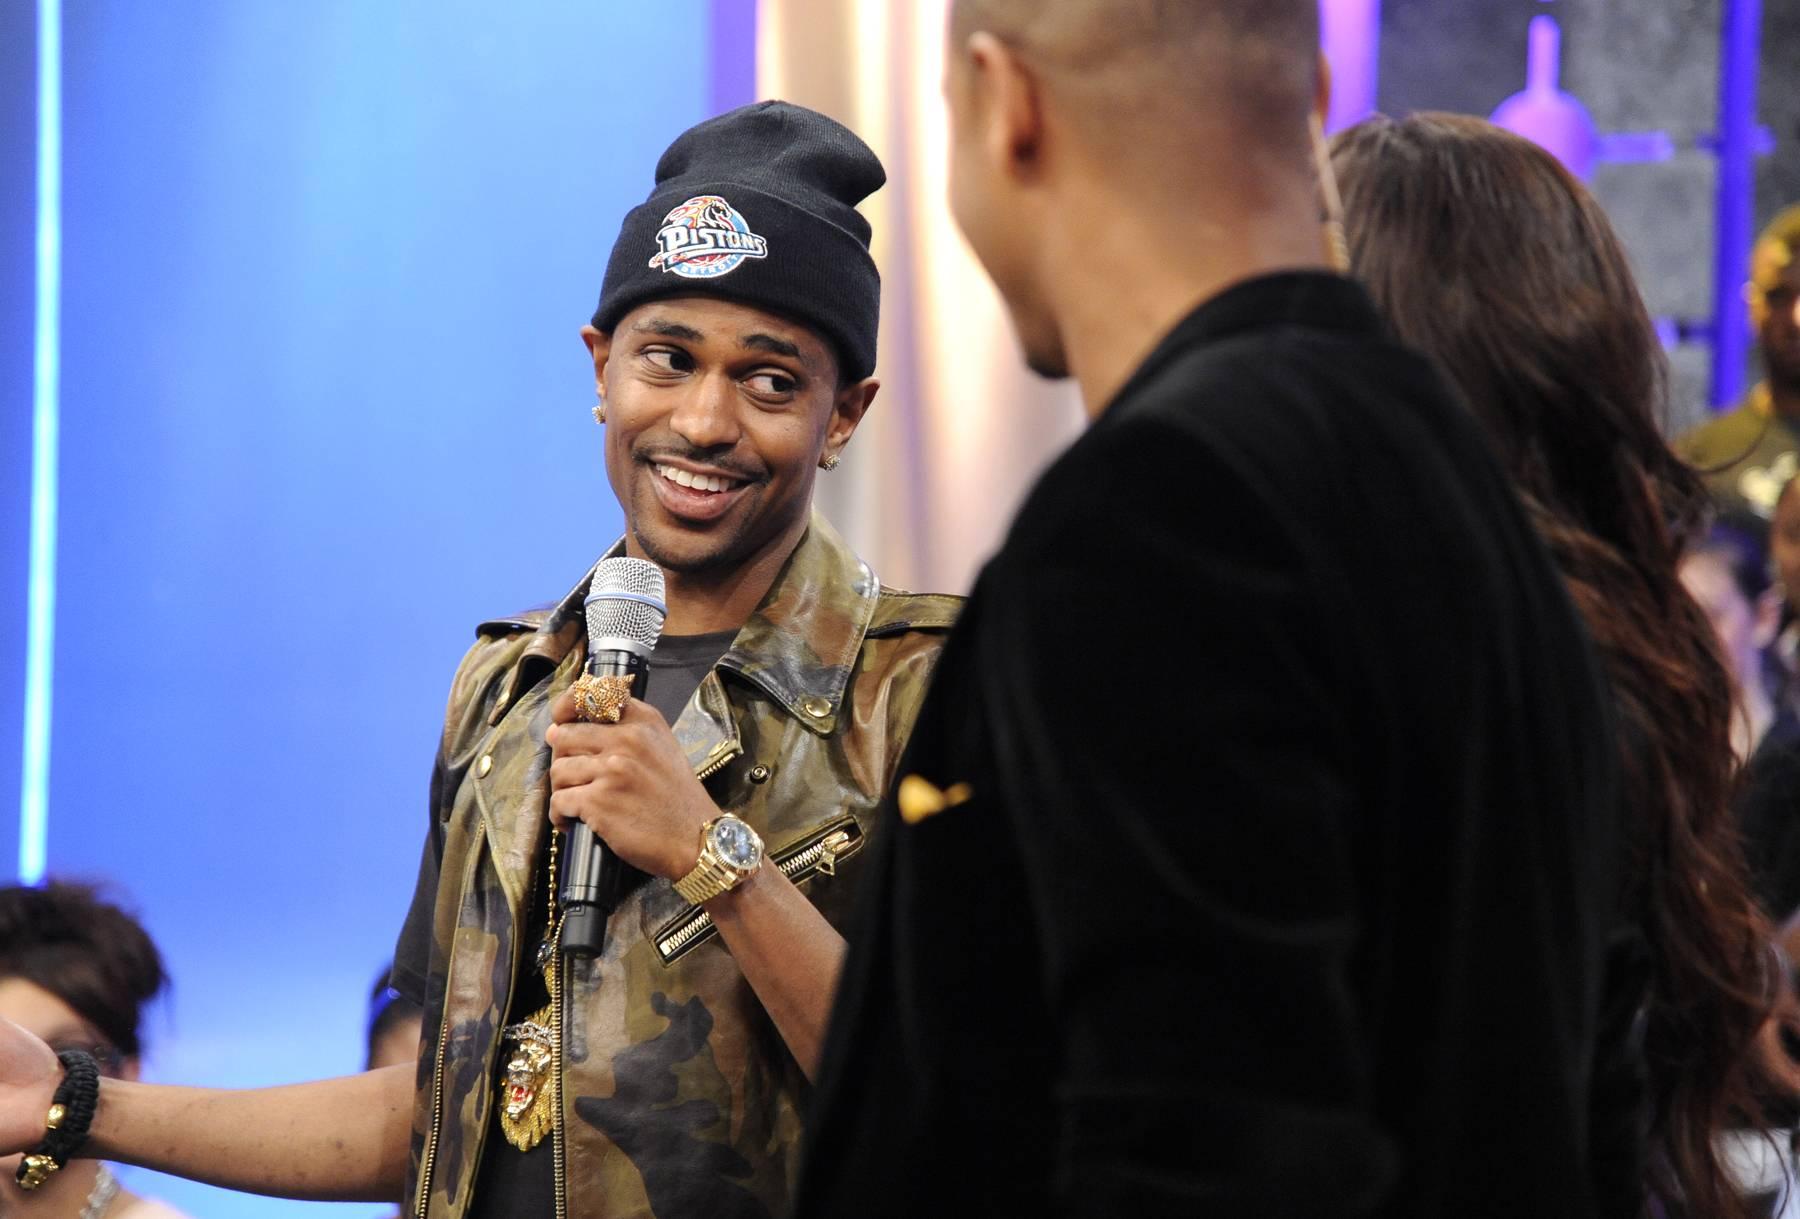 A Smile Worth a Million Bucks - Big Sean with Rocsi Diaz and Terrence J at 106 & Park, May 22, 2012. (Photo: John Ricard / BET)